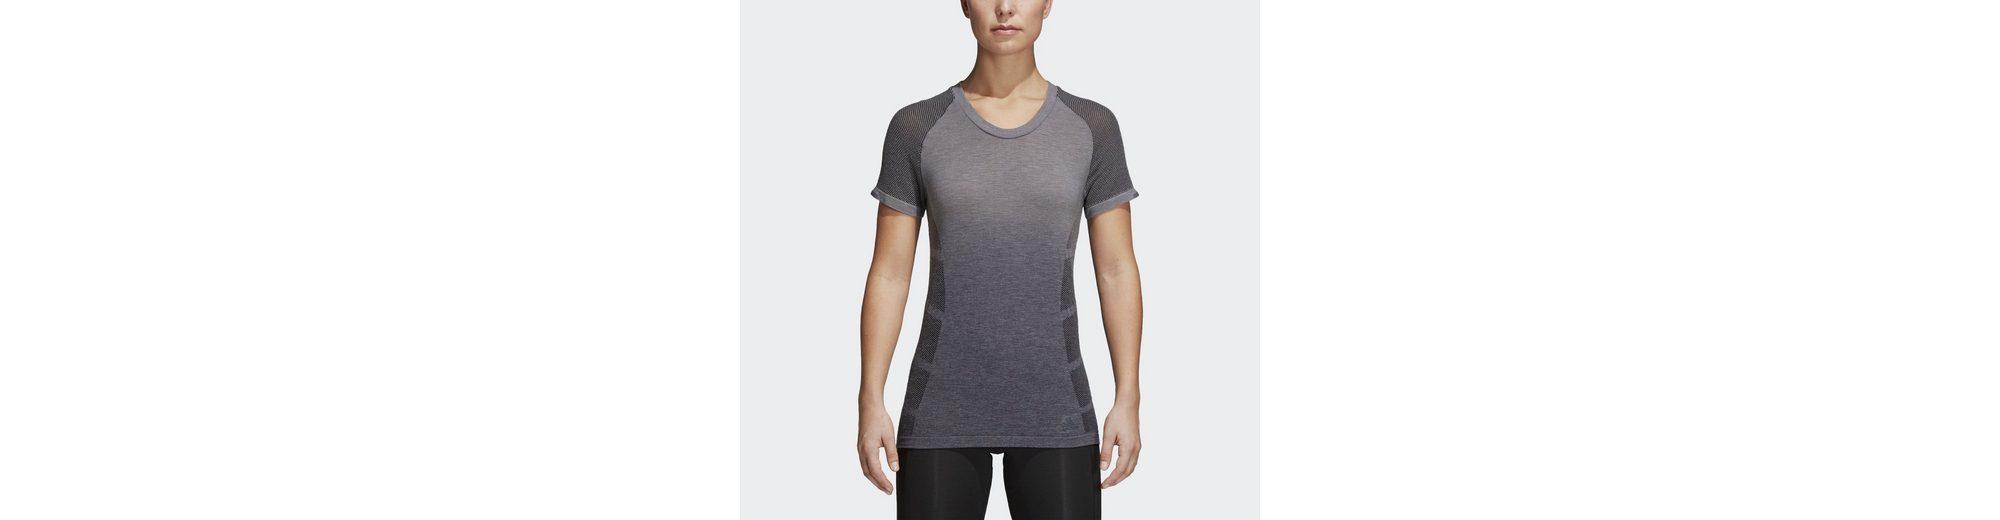 adidas Performance T-Shirt Ultra Primeknit Wool T-Shirt